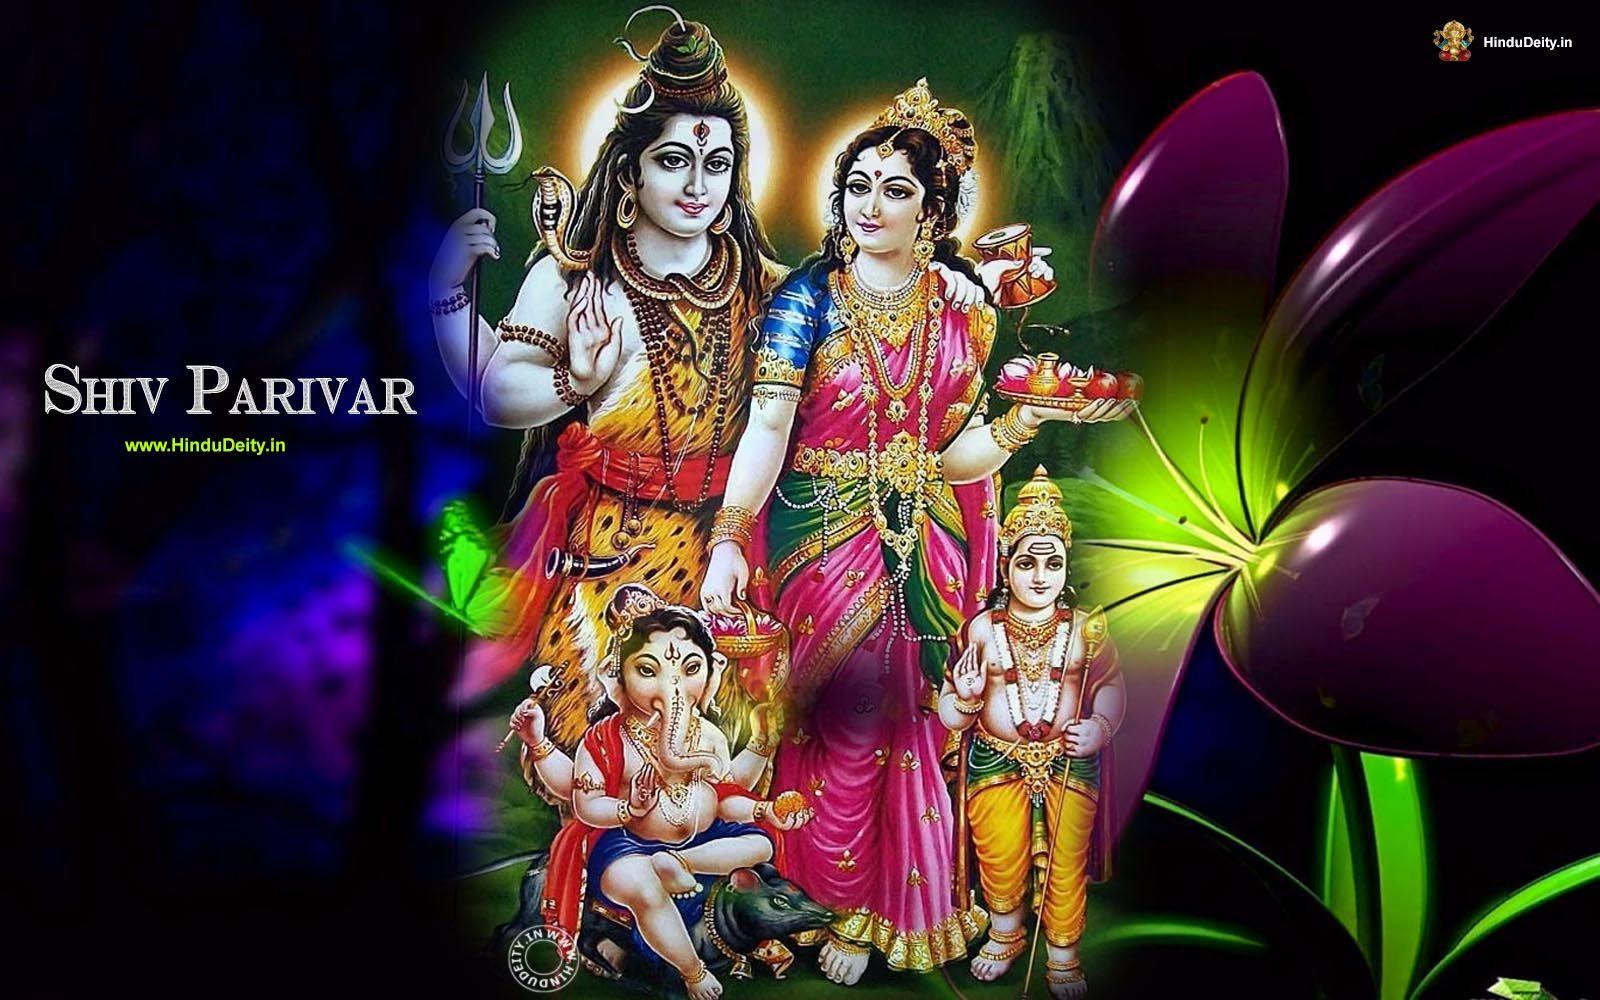 Free Download Shiv Parivar Wallpaper Images Photos Shiv